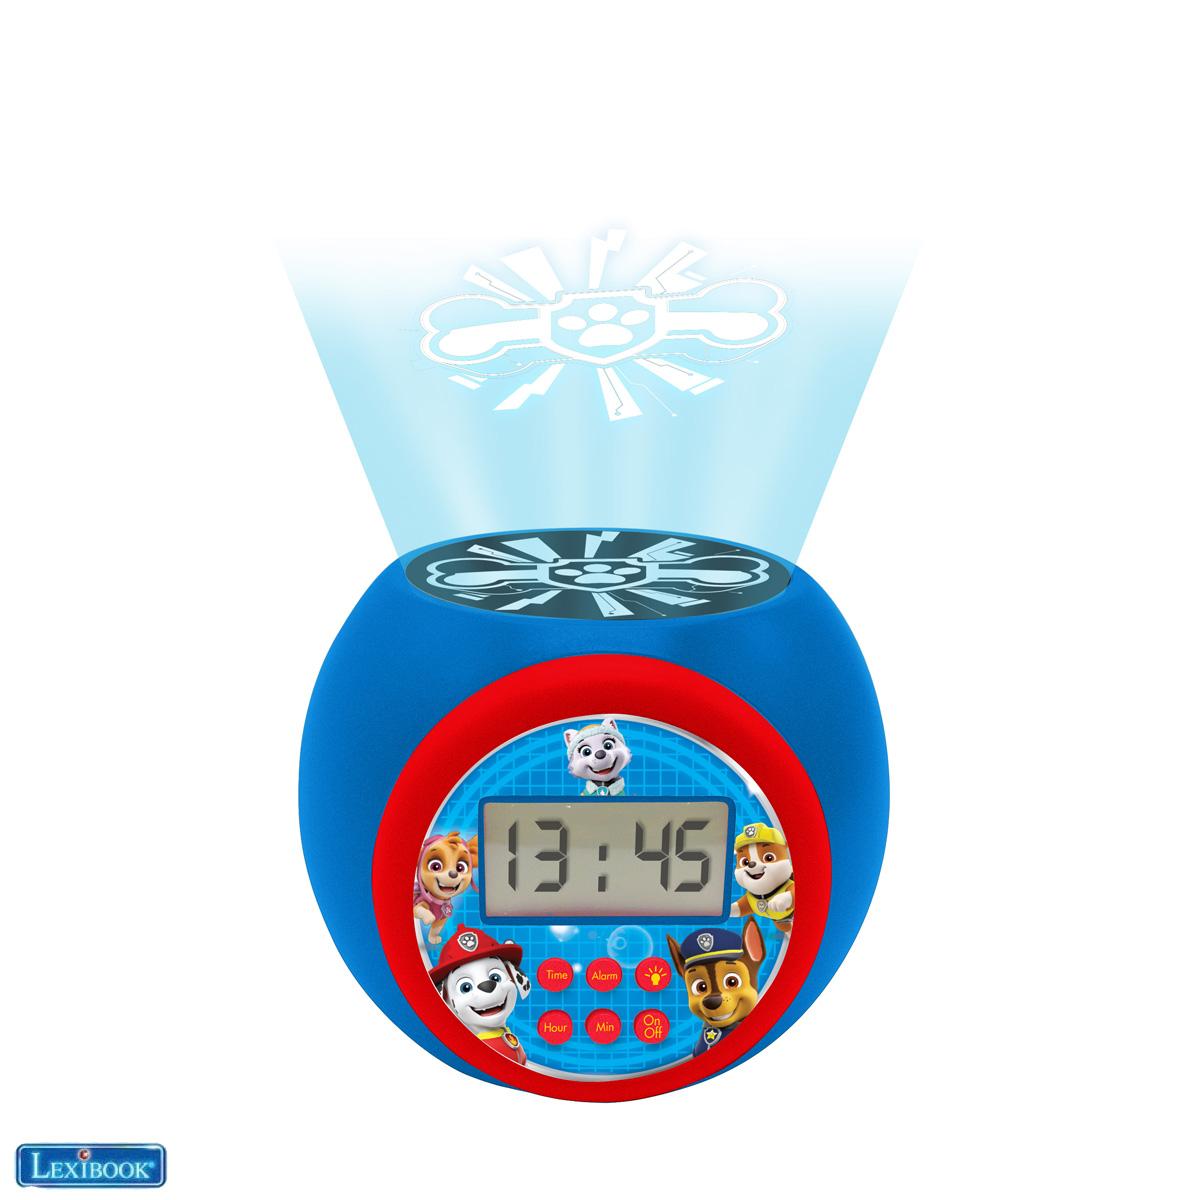 Lexibook - Paw Patrol Projector Alarm Clock with Timer (RL977PA)